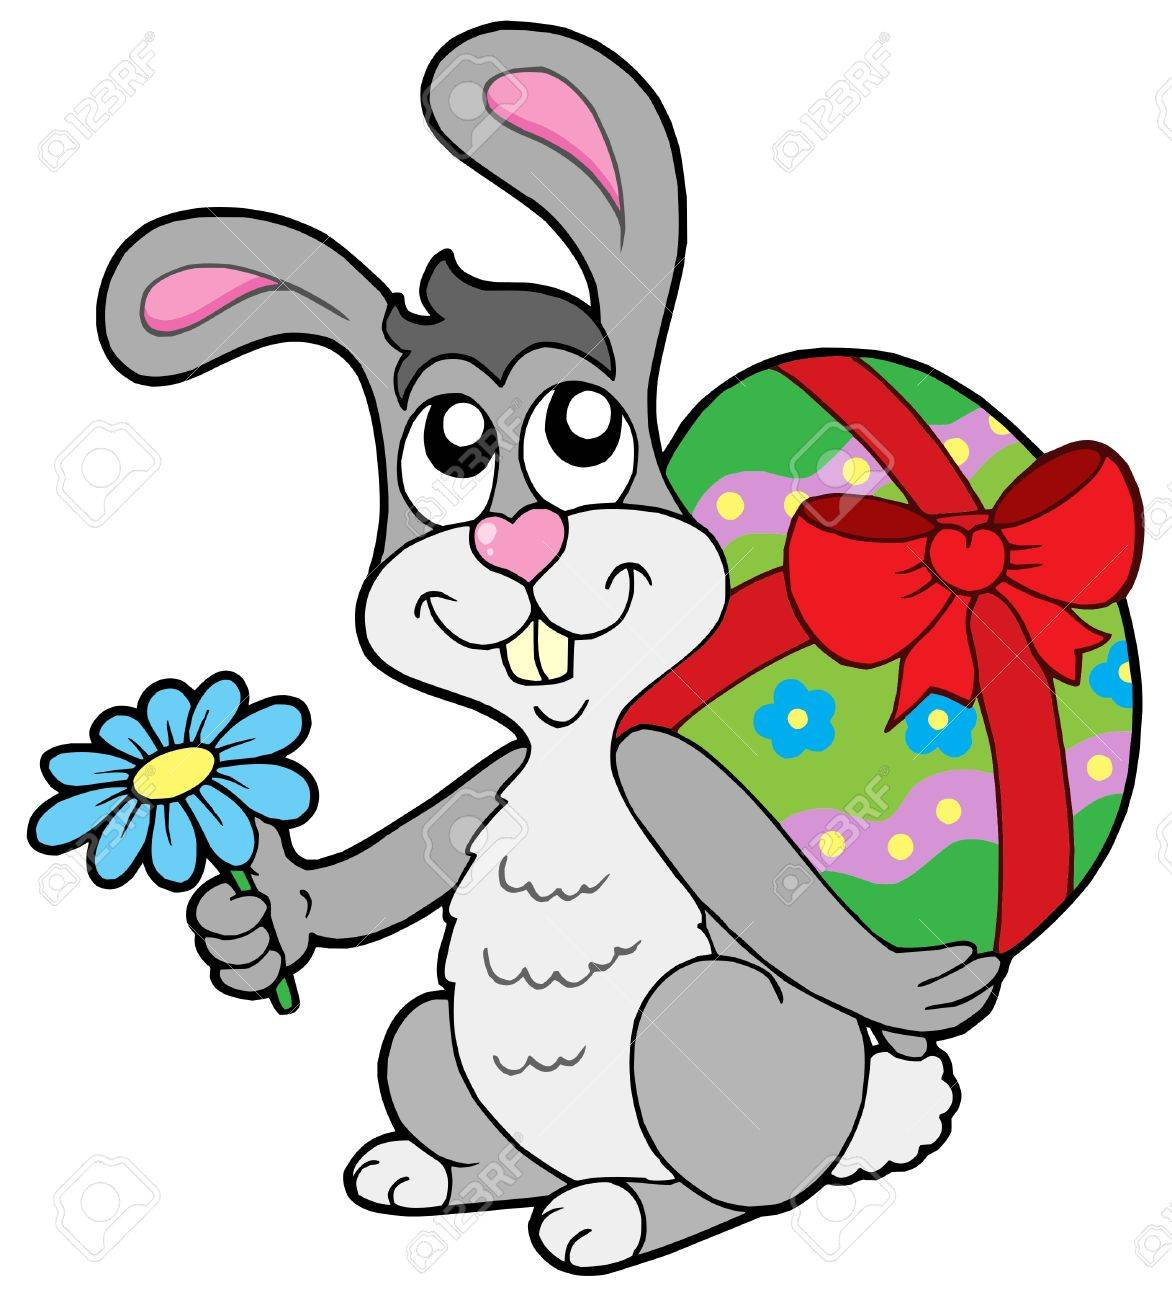 Small Easter bunny with egg - vector illustration. Standard-Bild - 4215709